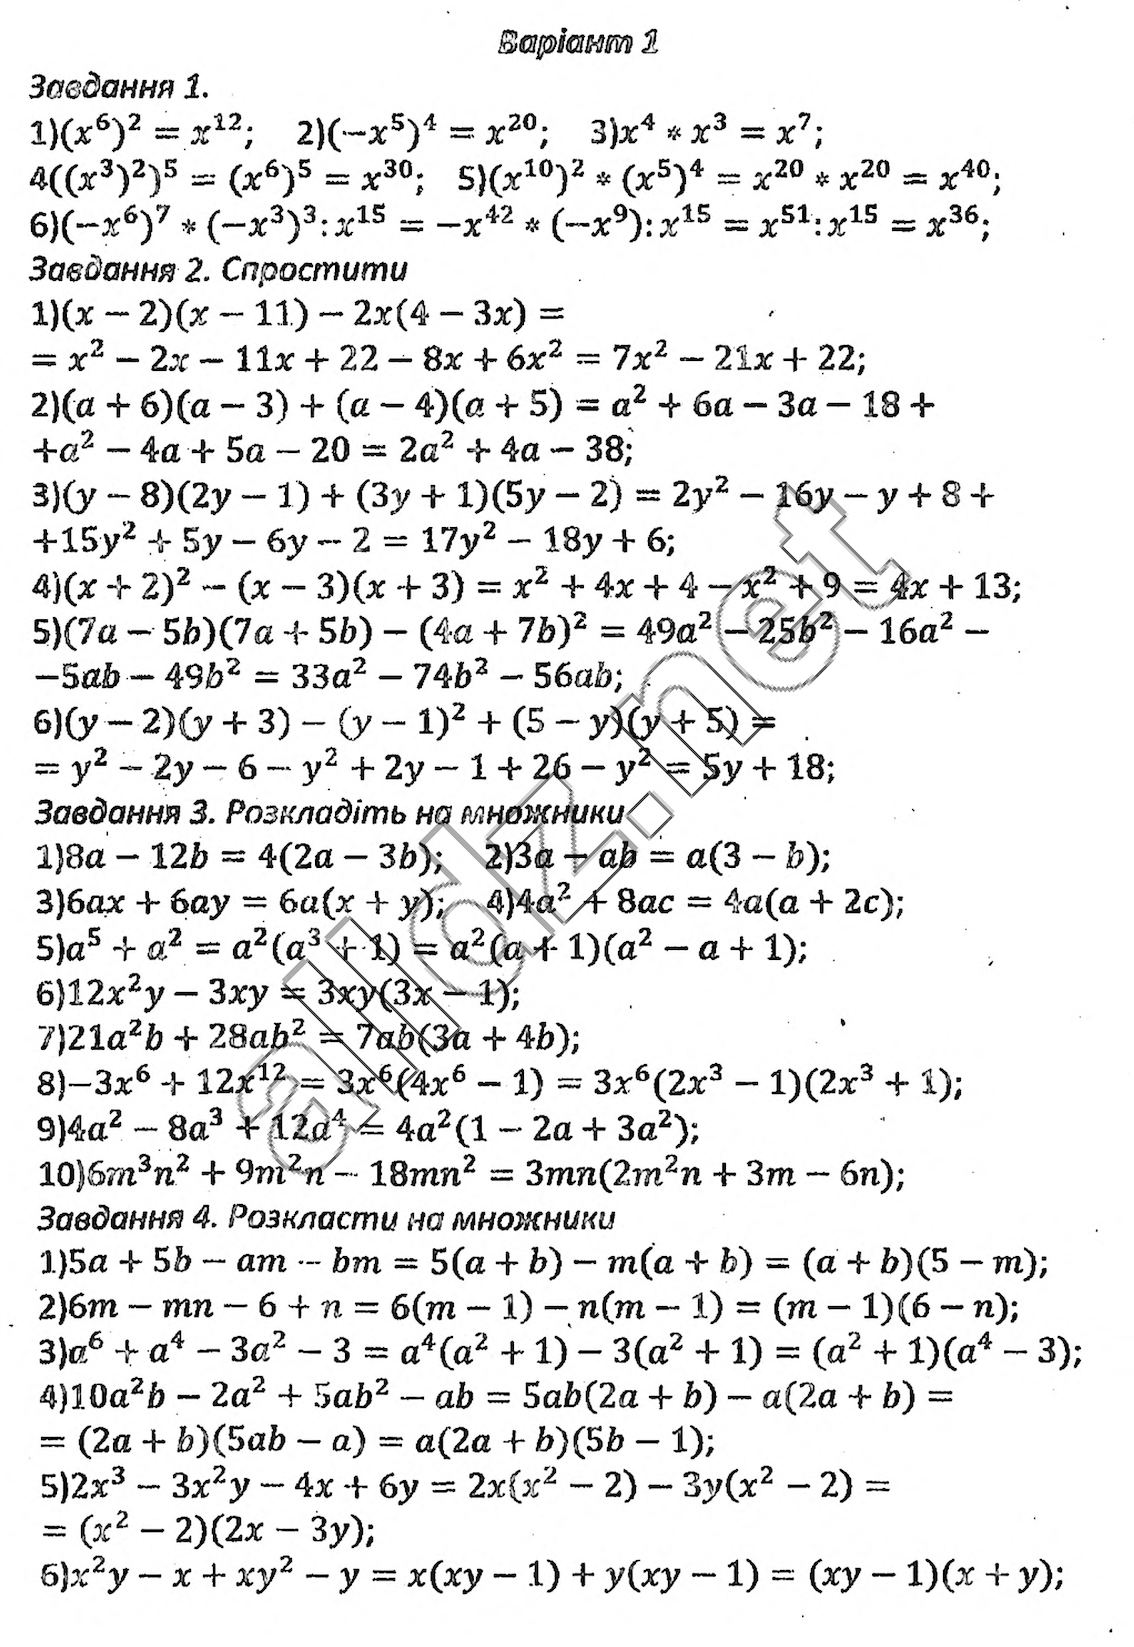 Збірник Алгебра 8 клас Мерзляк 2016